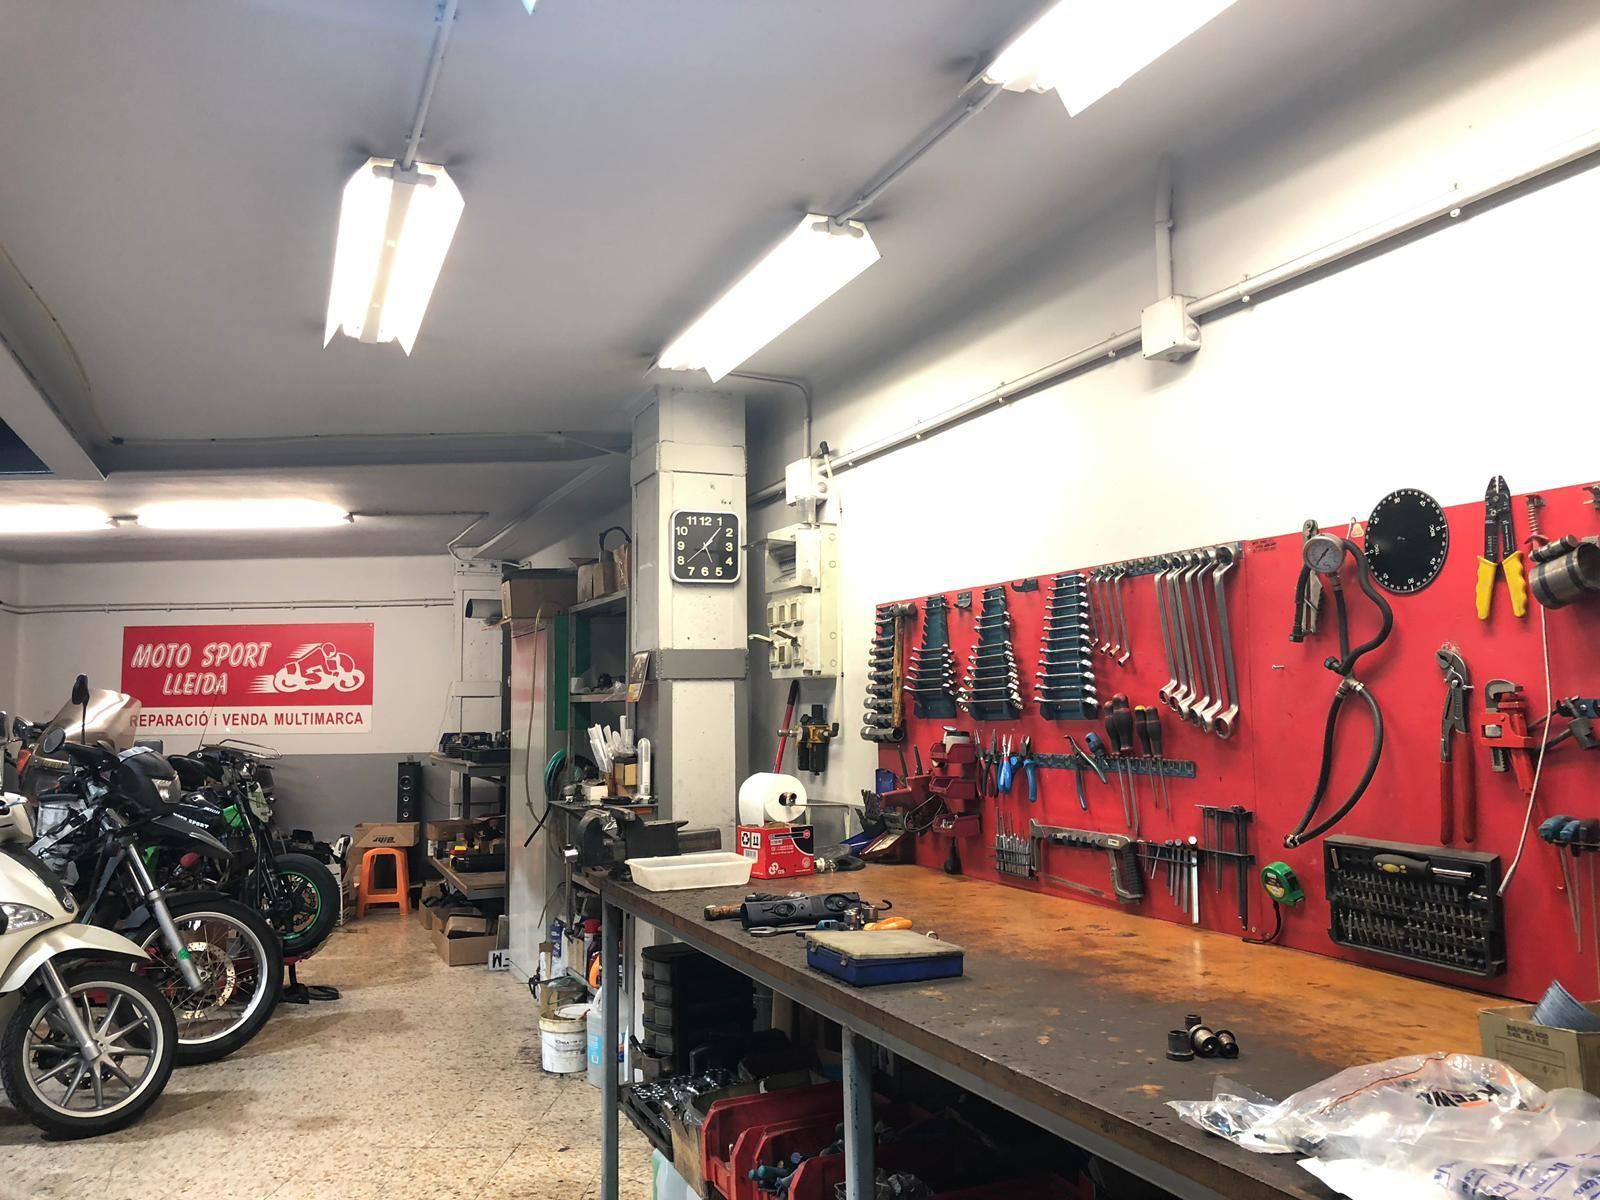 Dónde reparar motos Lleida